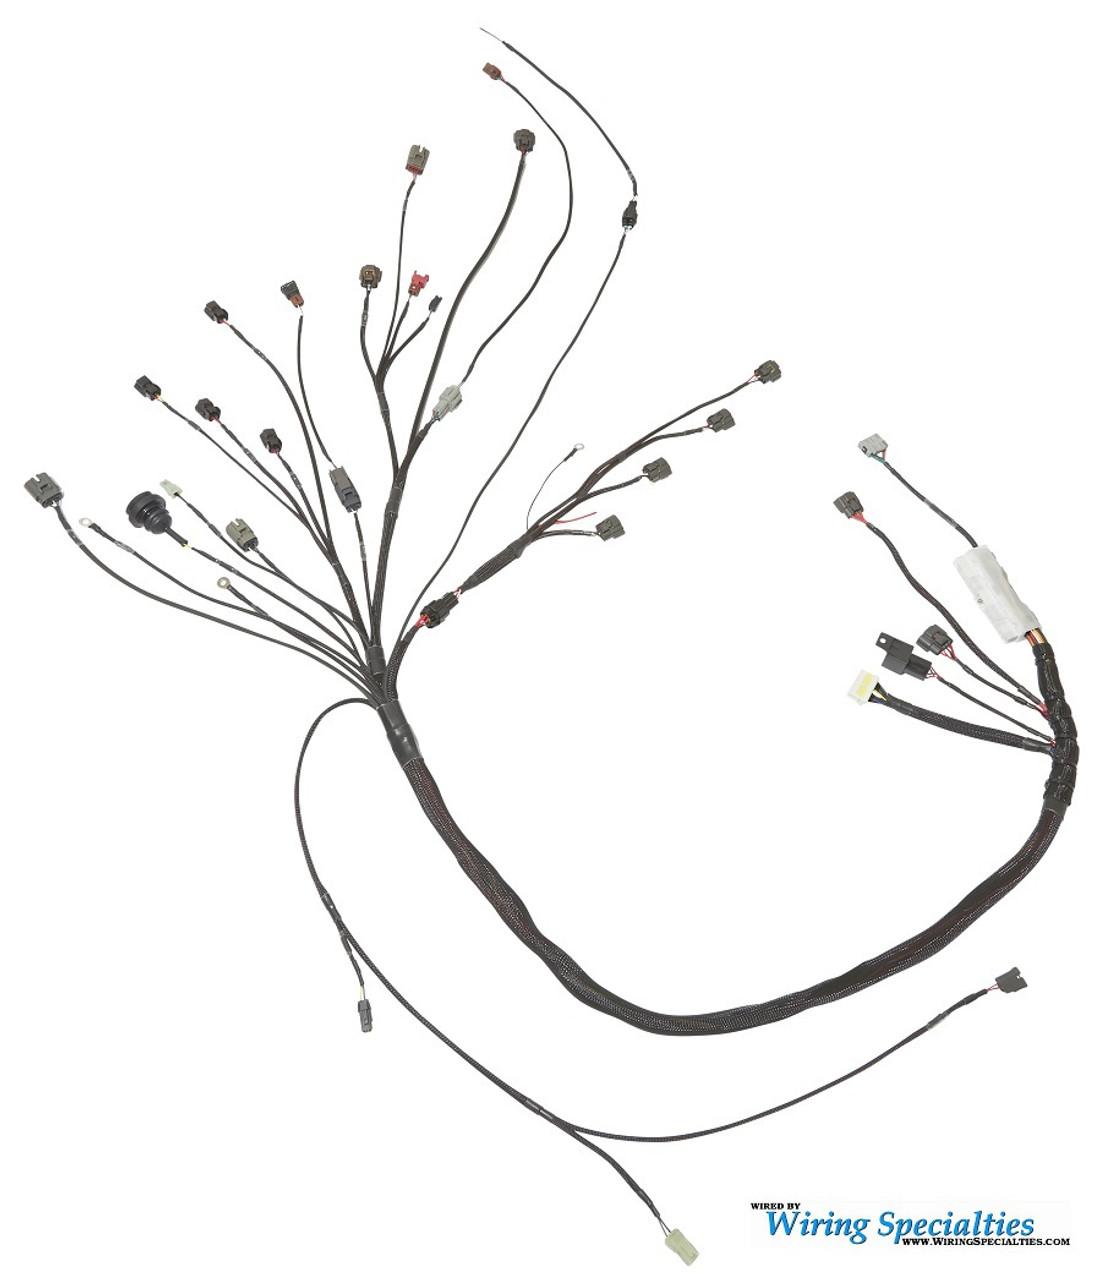 wiring specialties s13 sr20det pro harness for nissan 240sx '95 '98  nissan 240sx s14 sr20det transmission harness wiring specialties #10